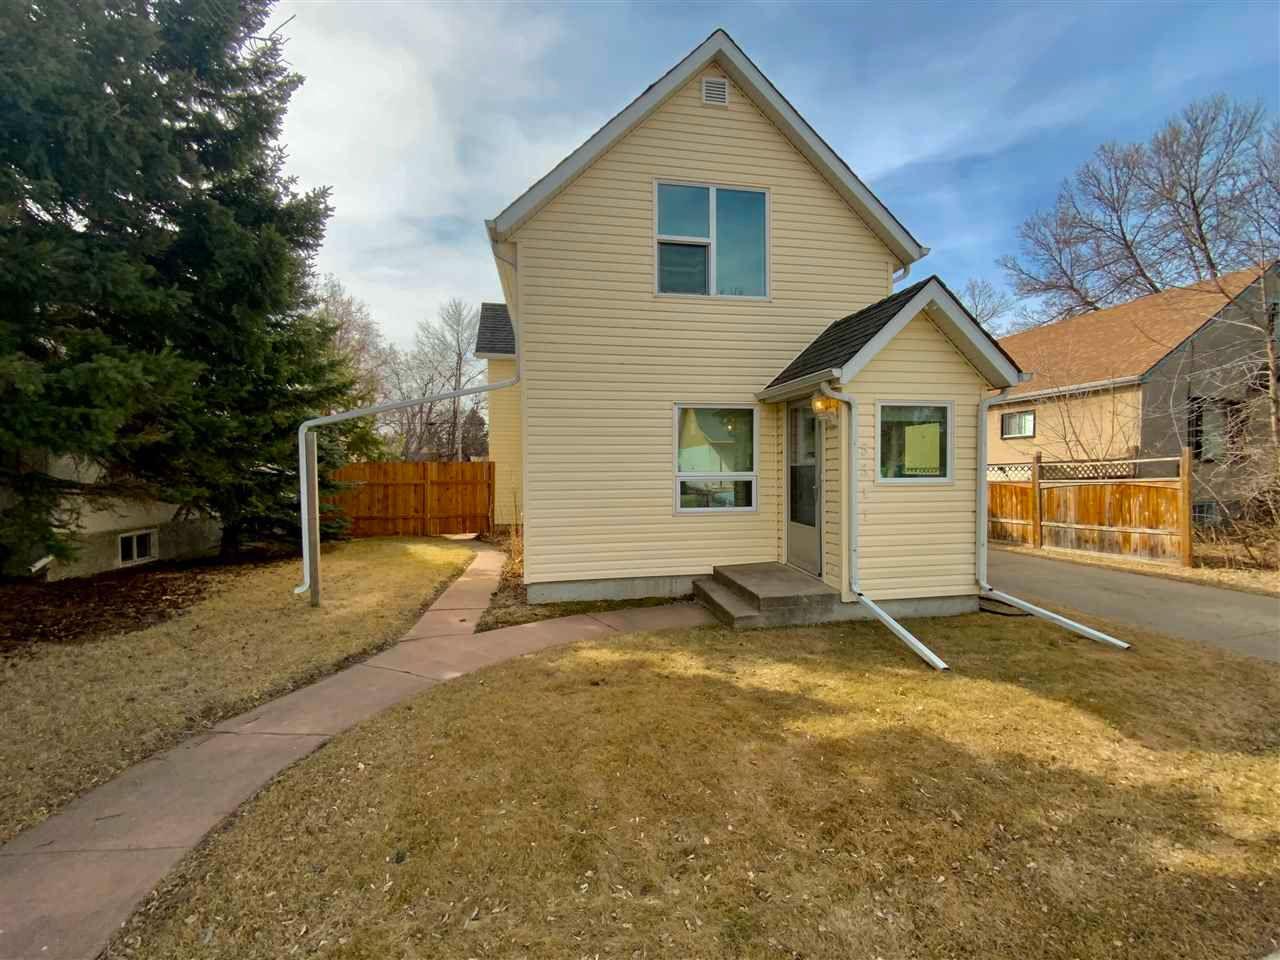 Main Photo: 5317 48 Avenue: Wetaskiwin House for sale : MLS®# E4233150